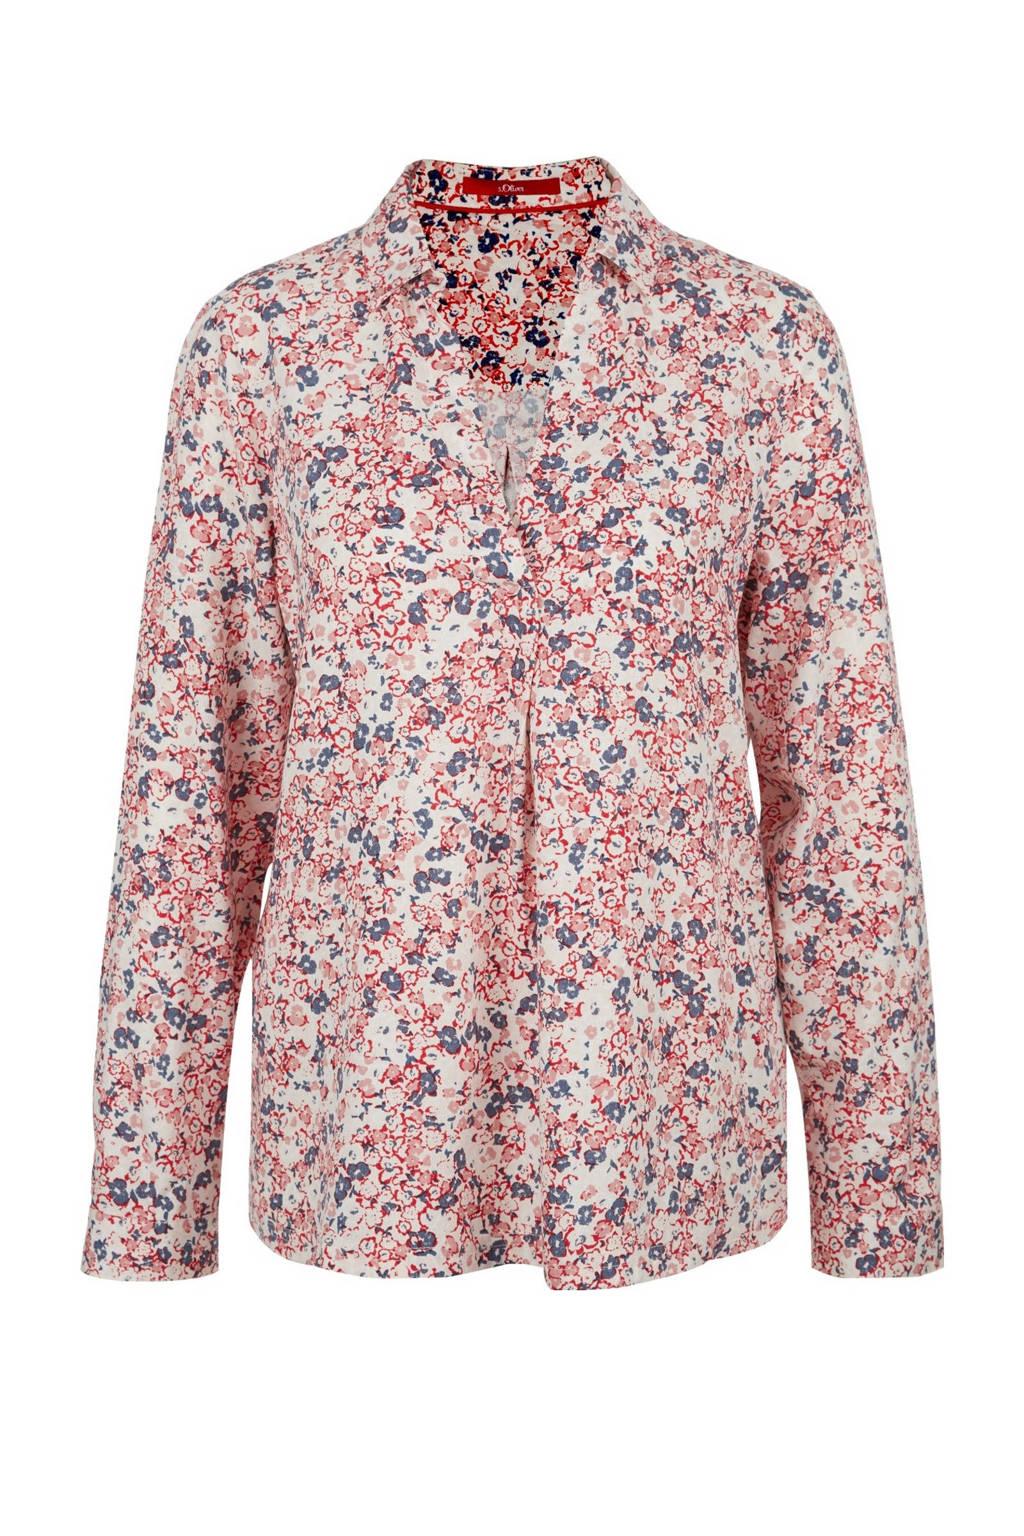 s.Oliver gebloemde blouse lichtroze/multi, Lichtroze/multi